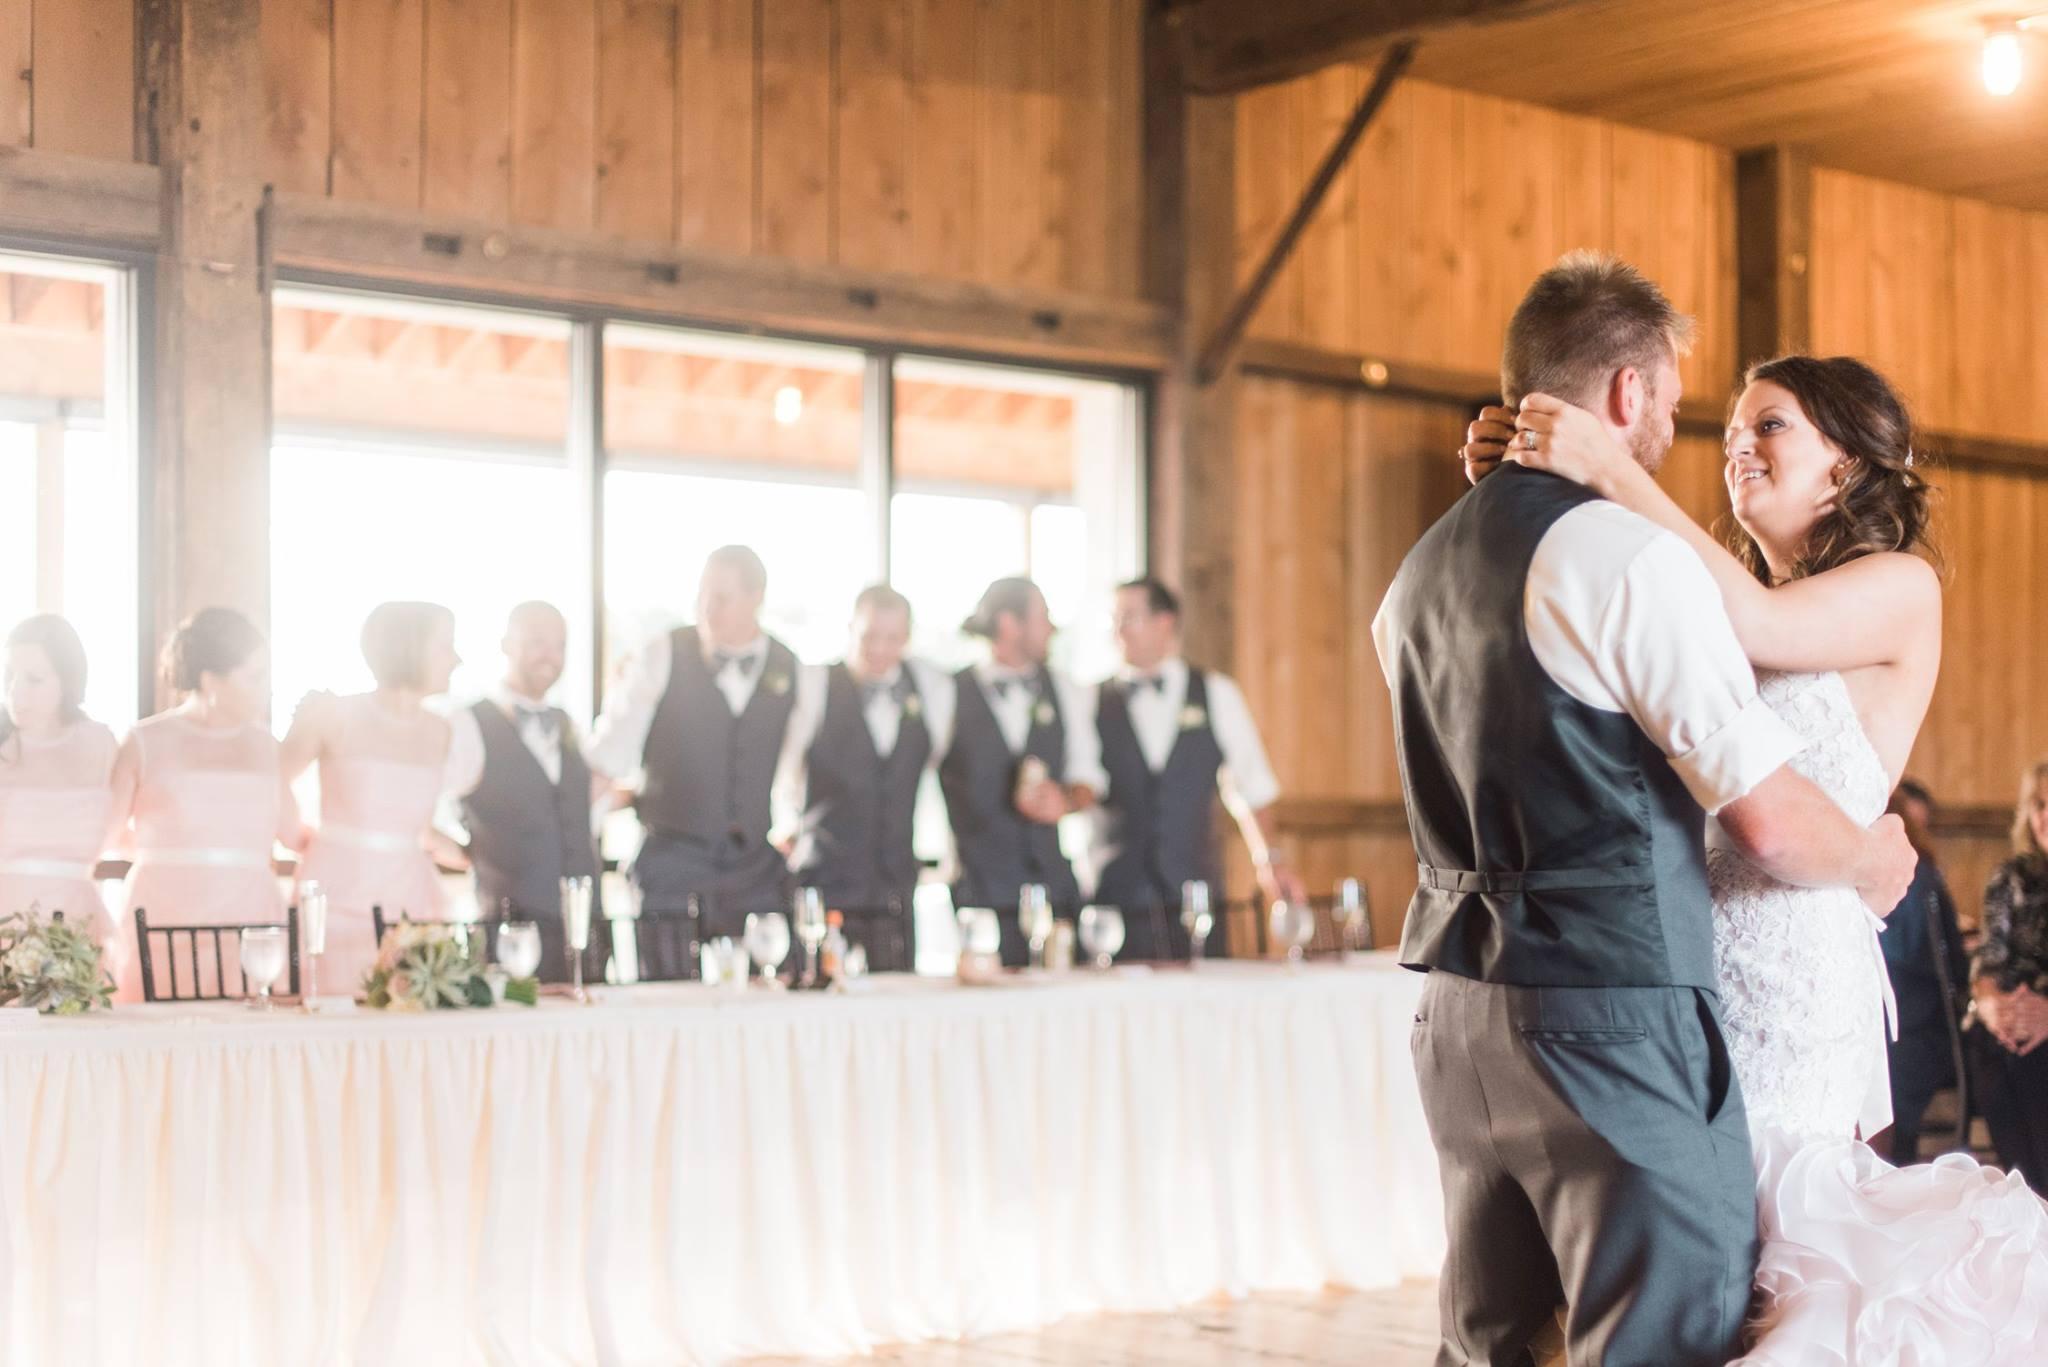 white-barn-pennsylvania-wedding-glam-rustic-farm-0024.jpg